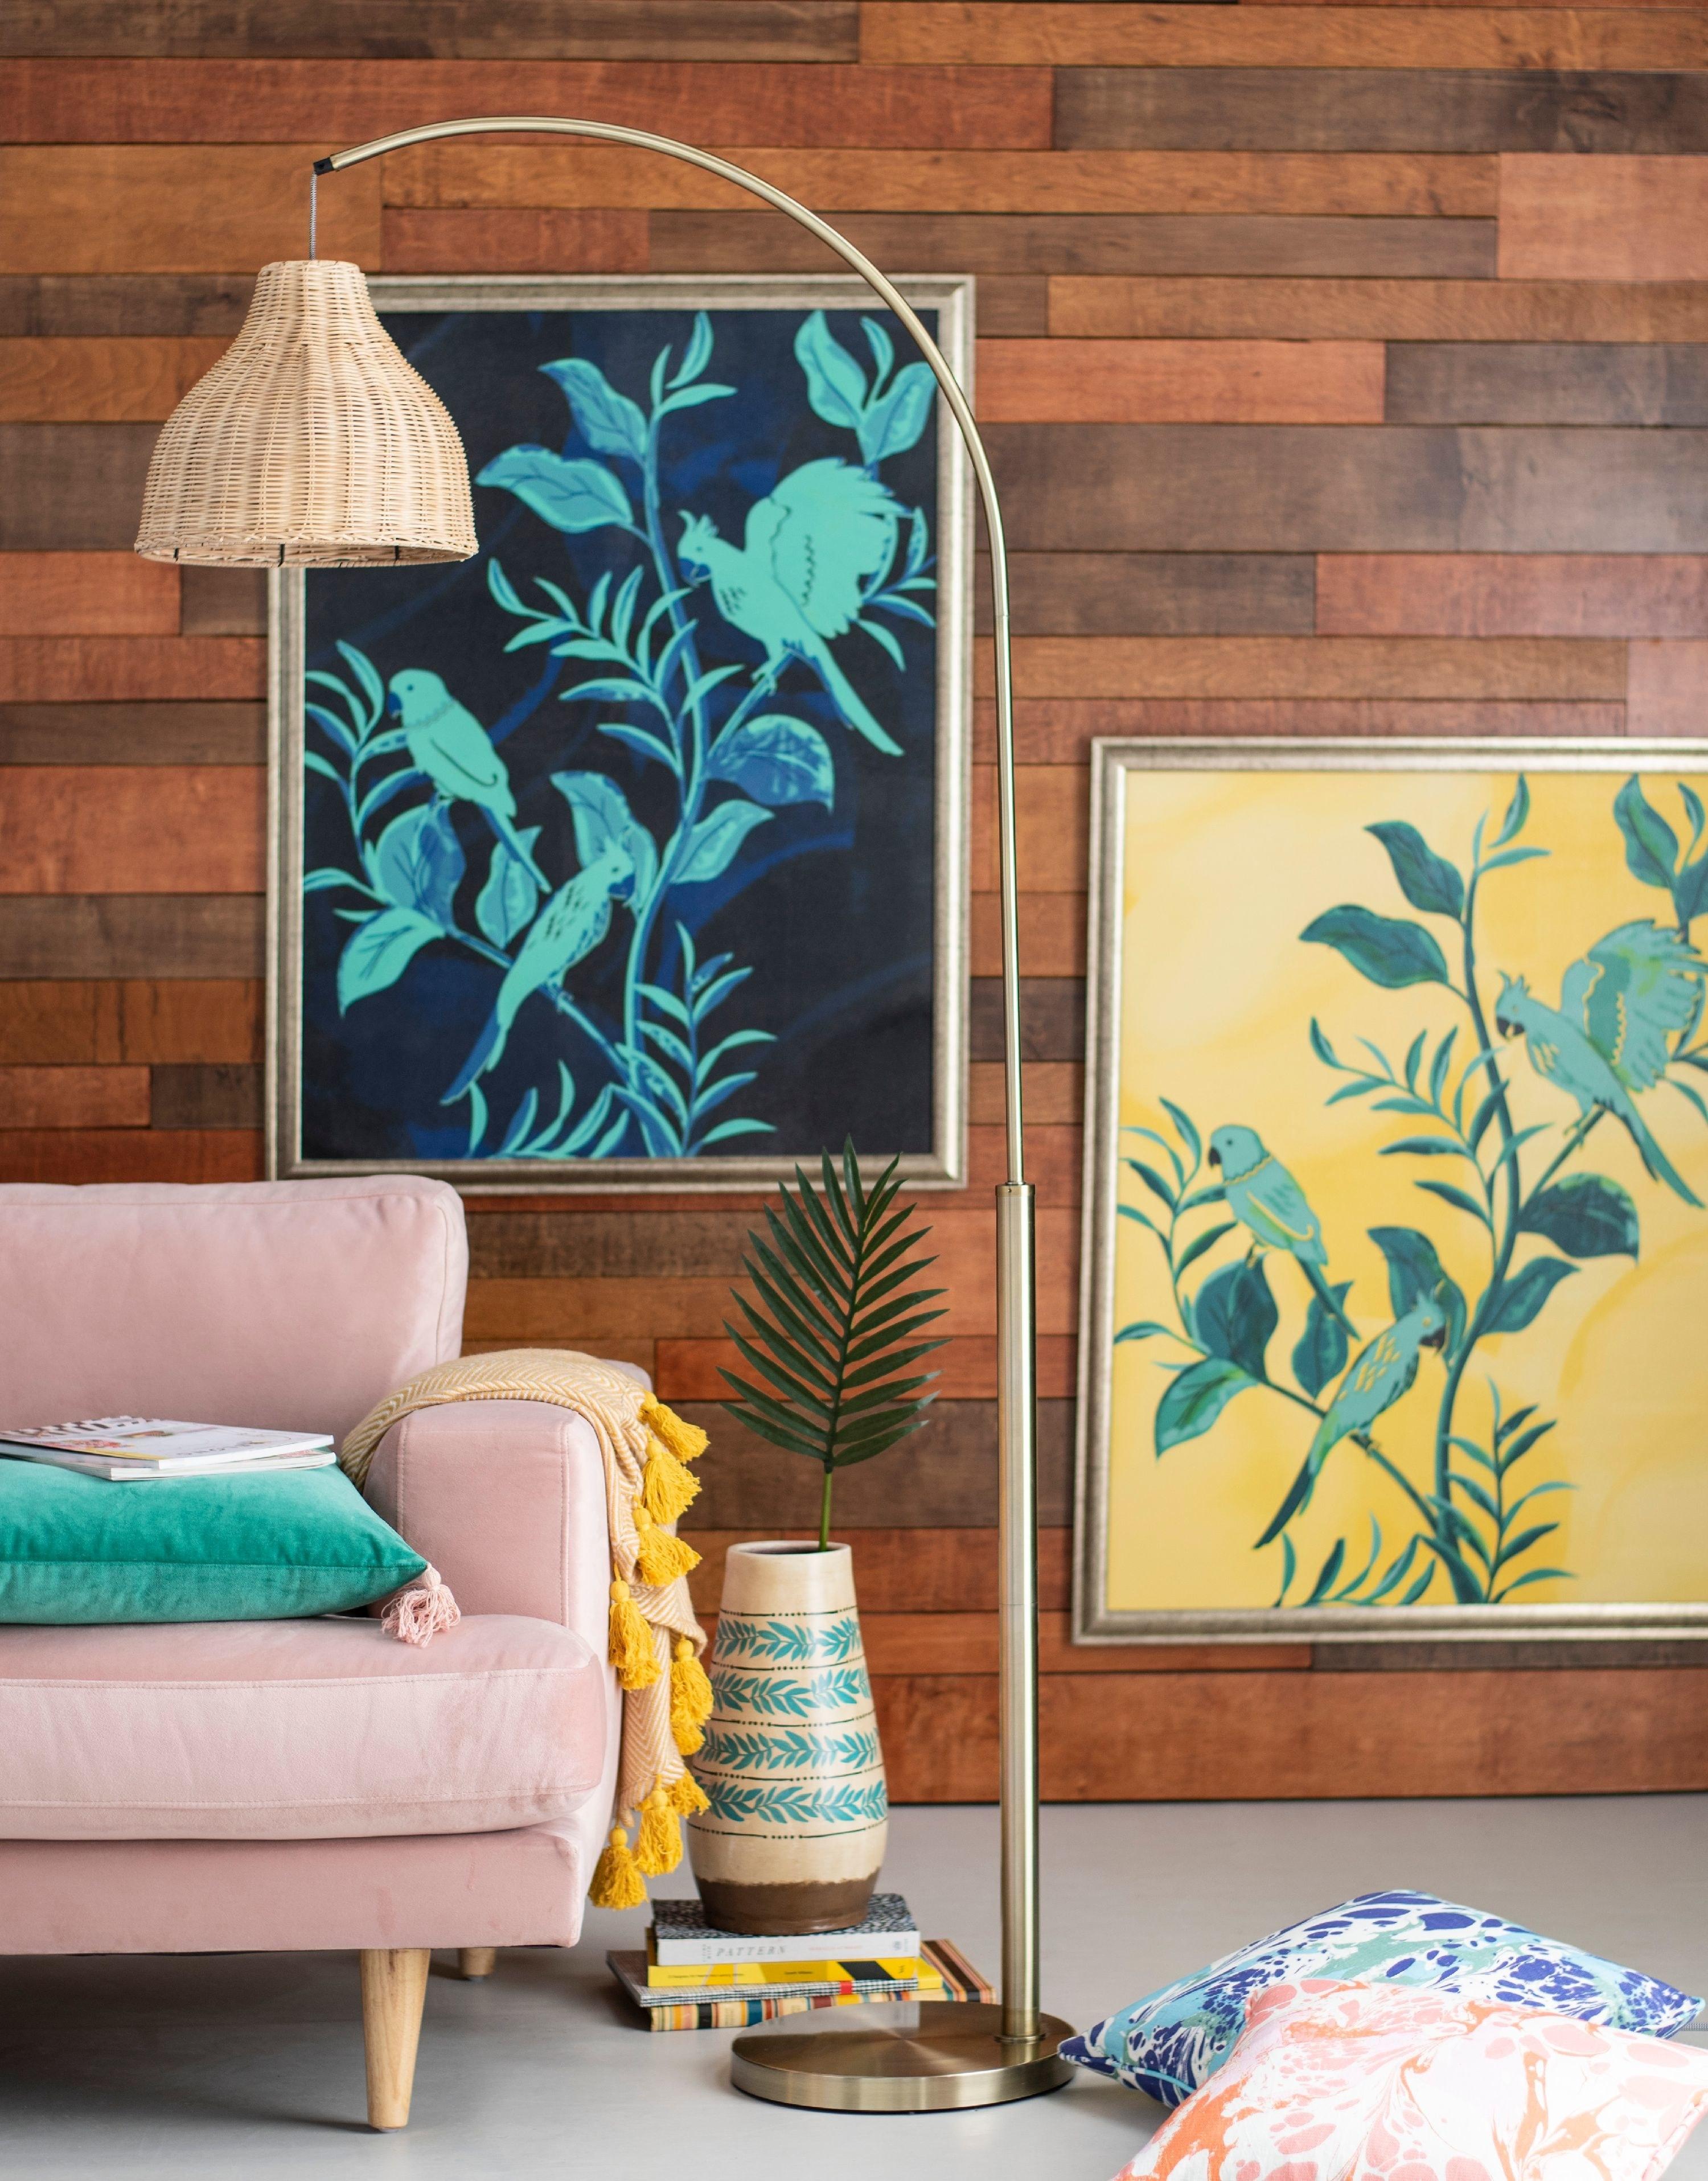 Floor lamp in colorful living room